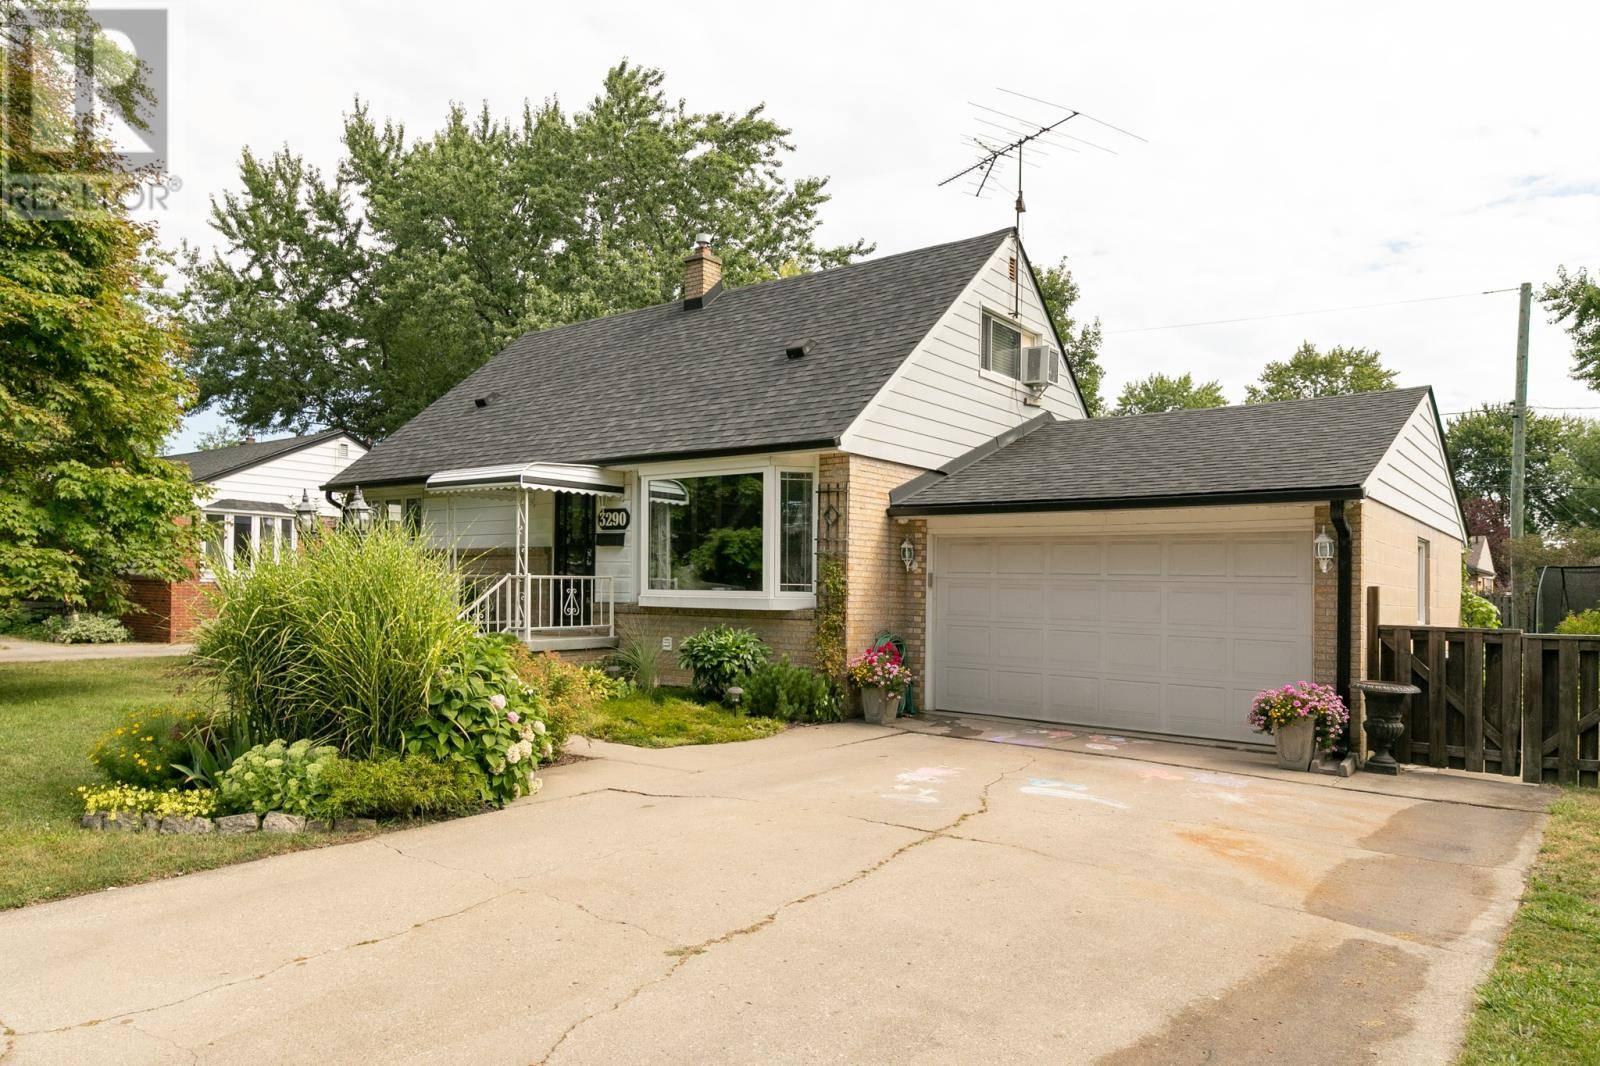 House for sale at 3290 Dandurand  Windsor Ontario - MLS: 19023701